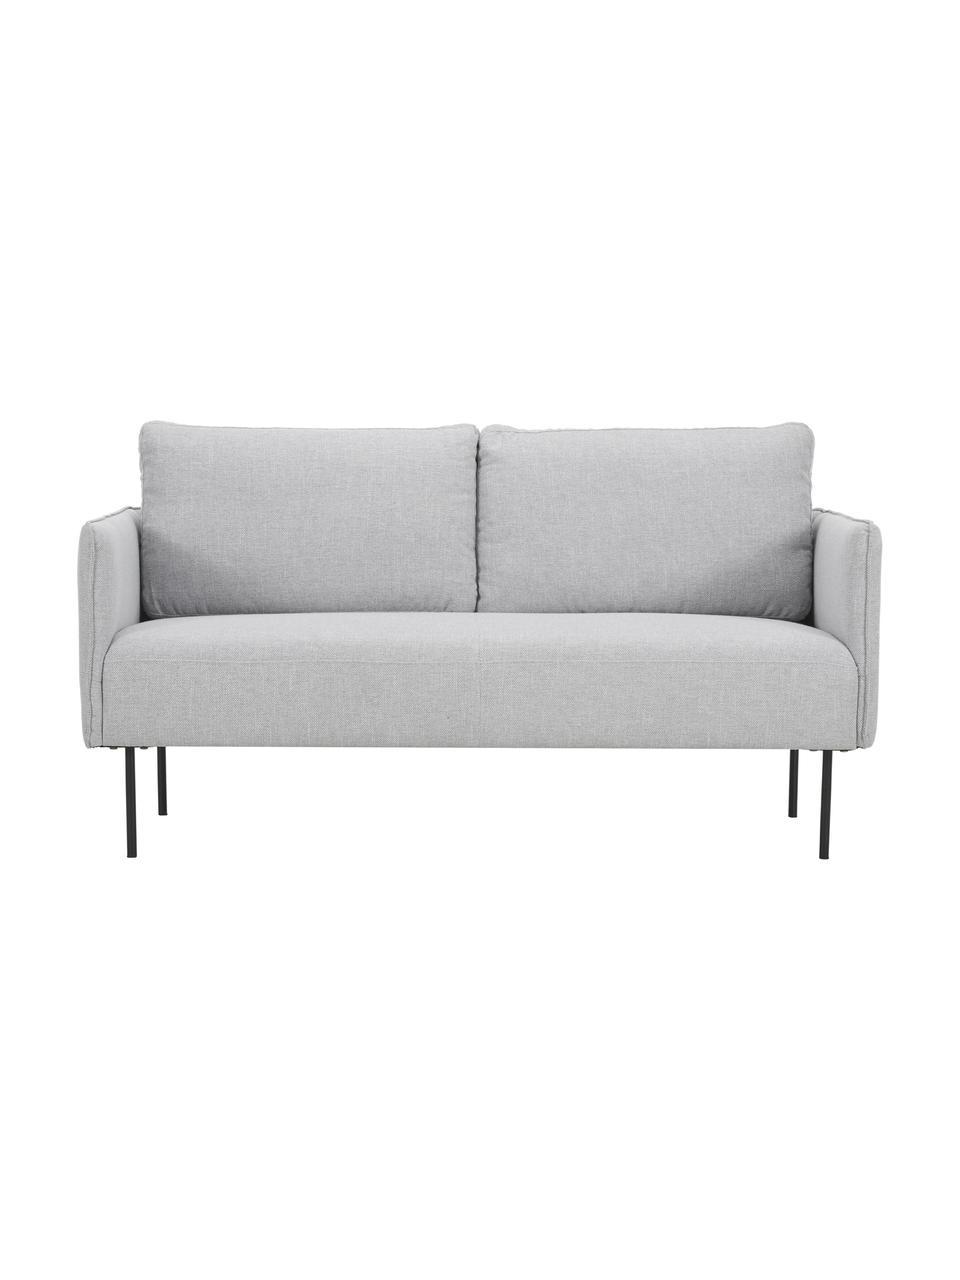 Canapé 2places gris clair Ramira, Tissu gris clair